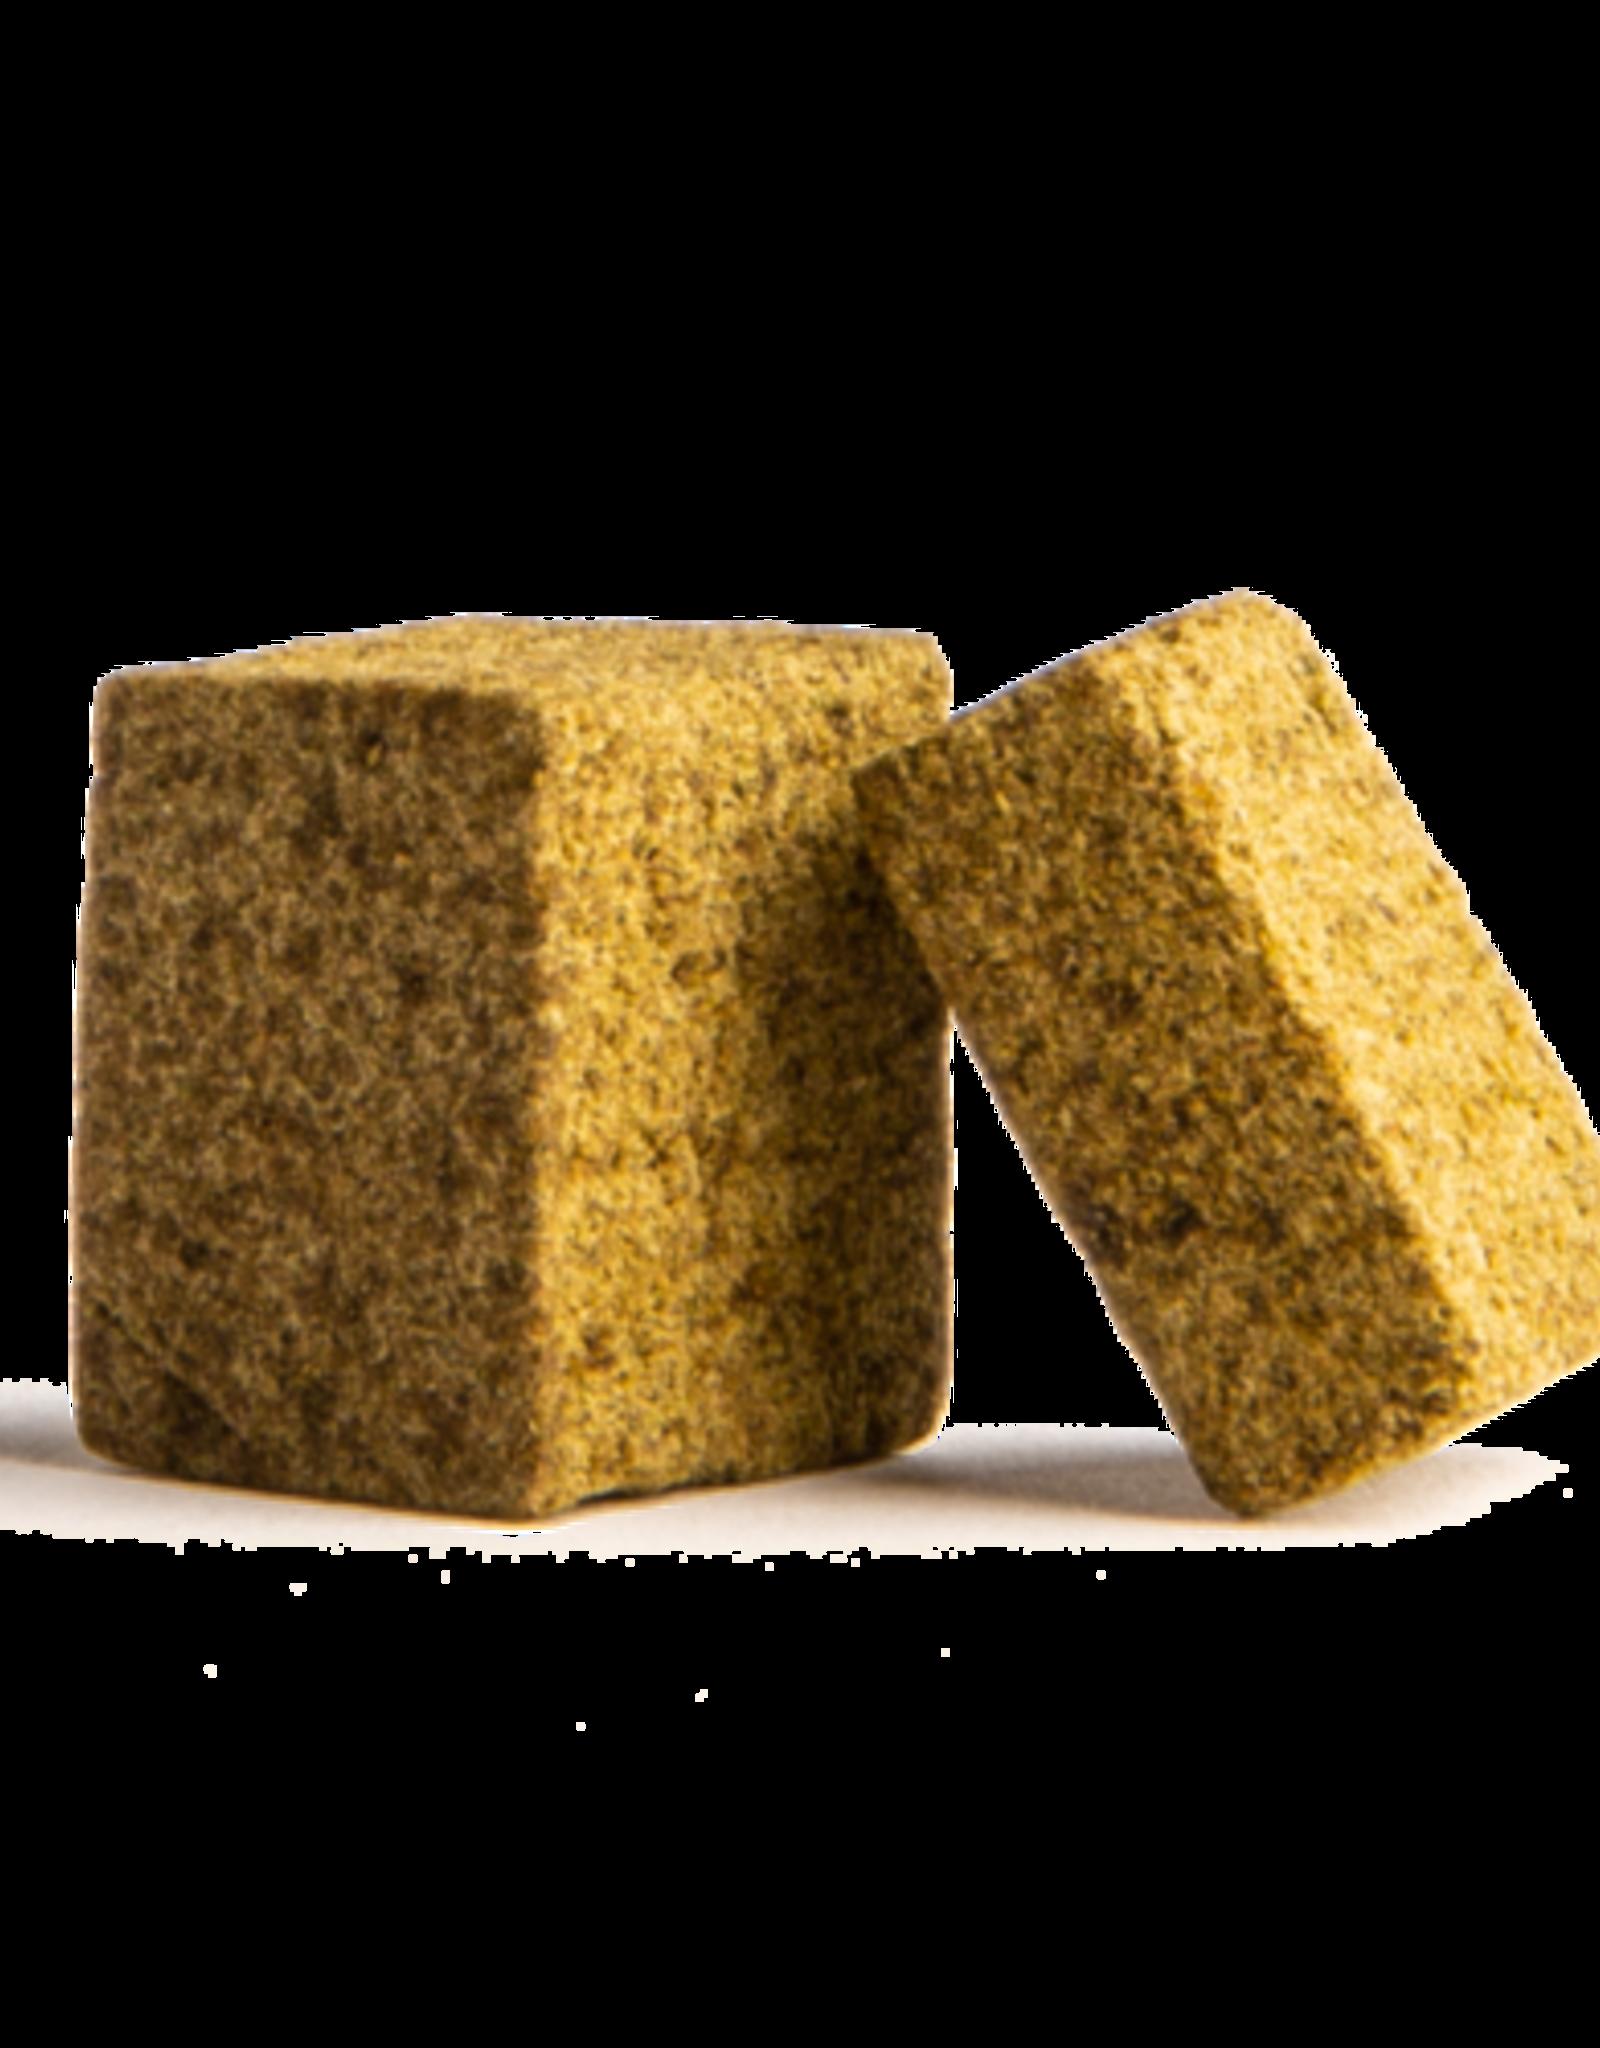 TGOD Highly Dutch - Organic Marrakech Gold Hash - 1g